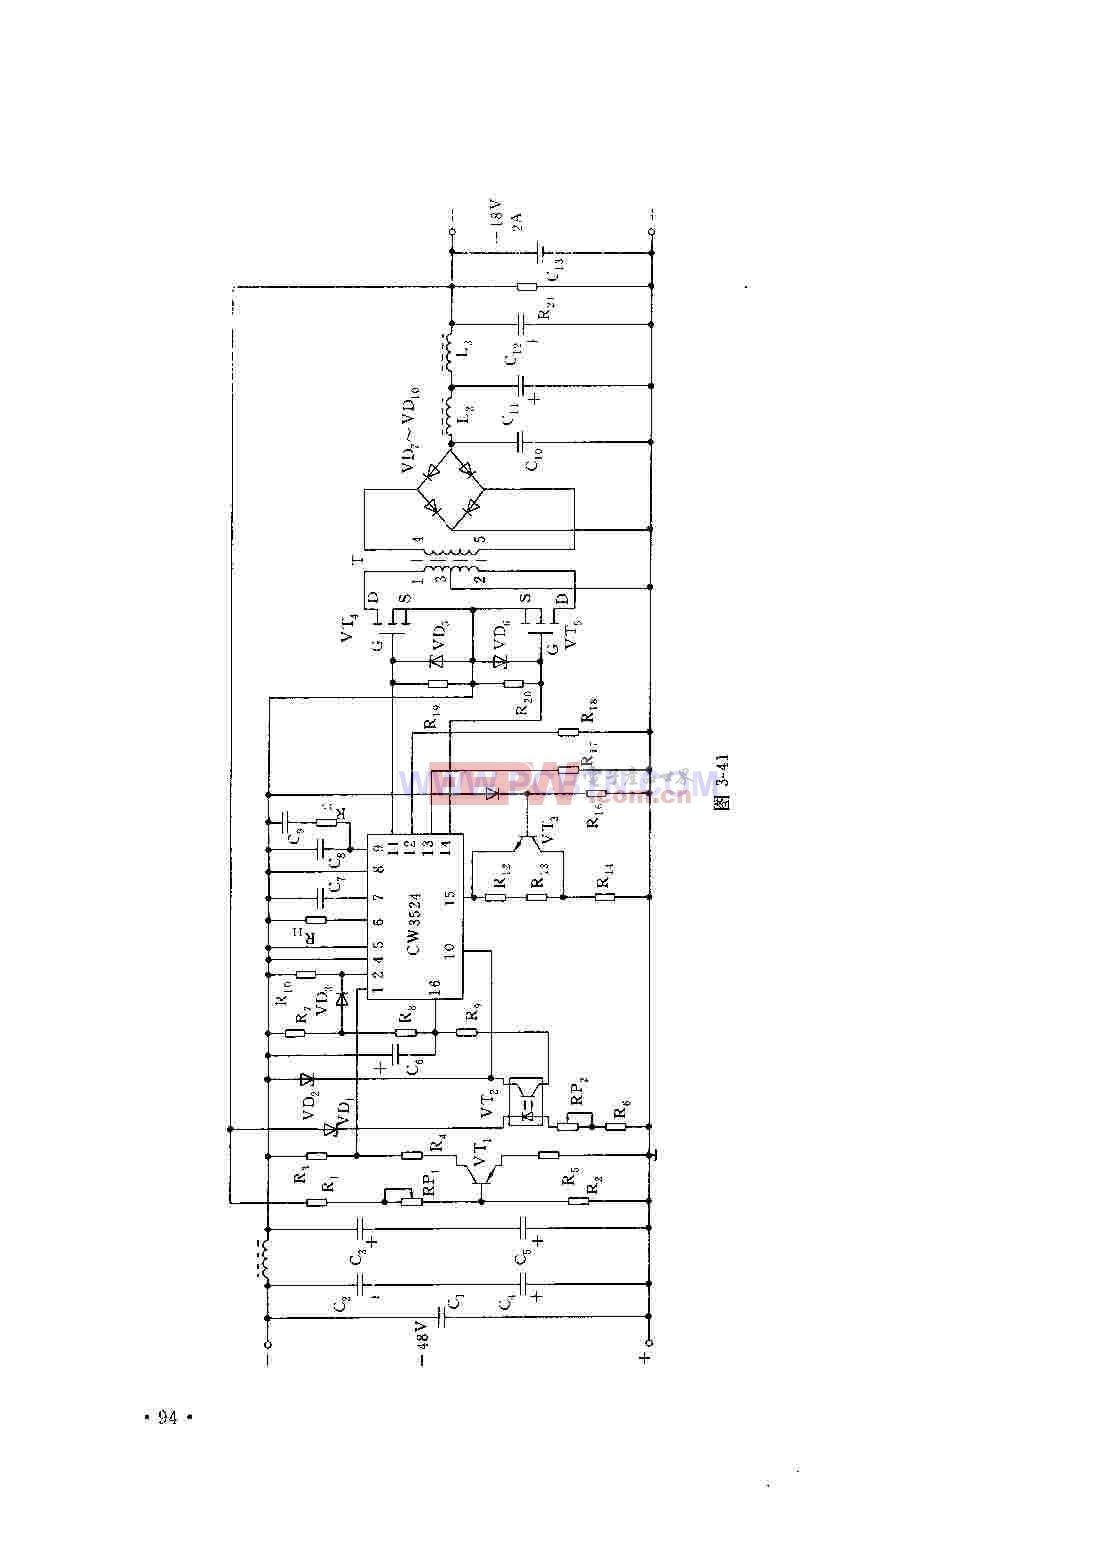 cw3524是目前在国内较为流行的脉宽调制型开关稳压电源集成控制